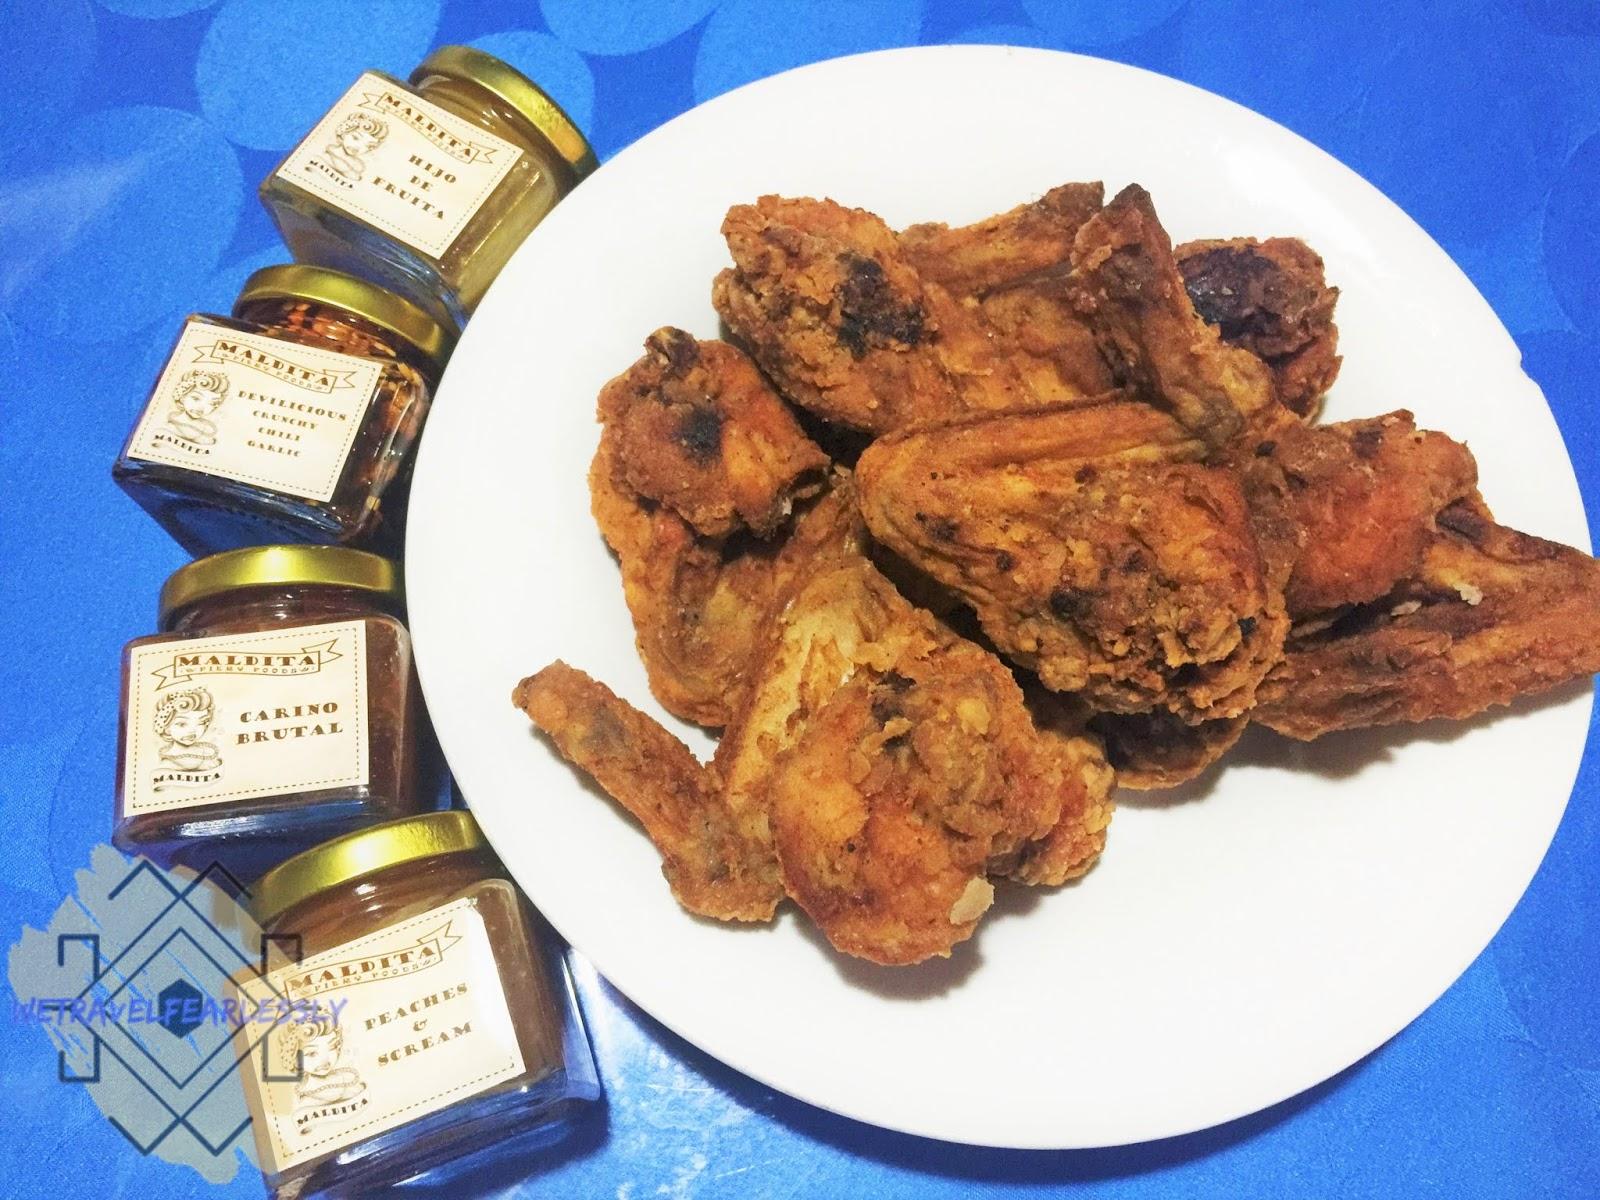 Maldita Fiery Foods - Hot sauce and crispy fried chicken? Take me to heaven man!